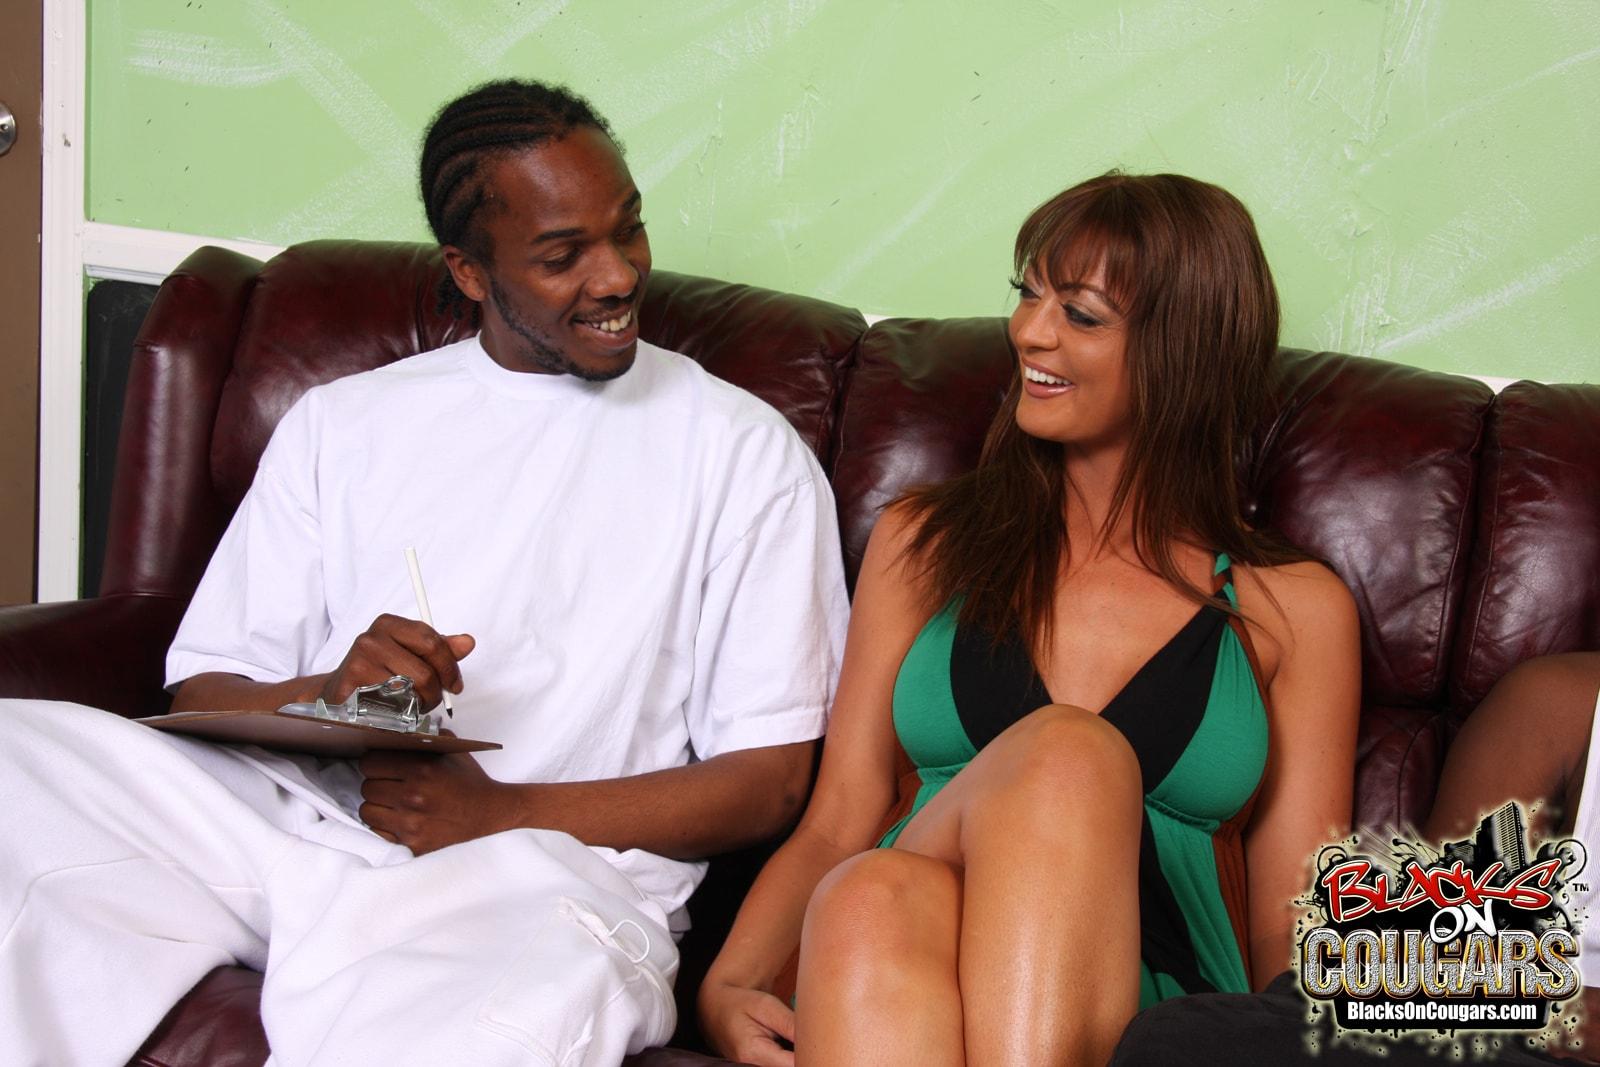 Dogfart '- Blacks On Cougars' starring Michaela Mancini (Photo 5)